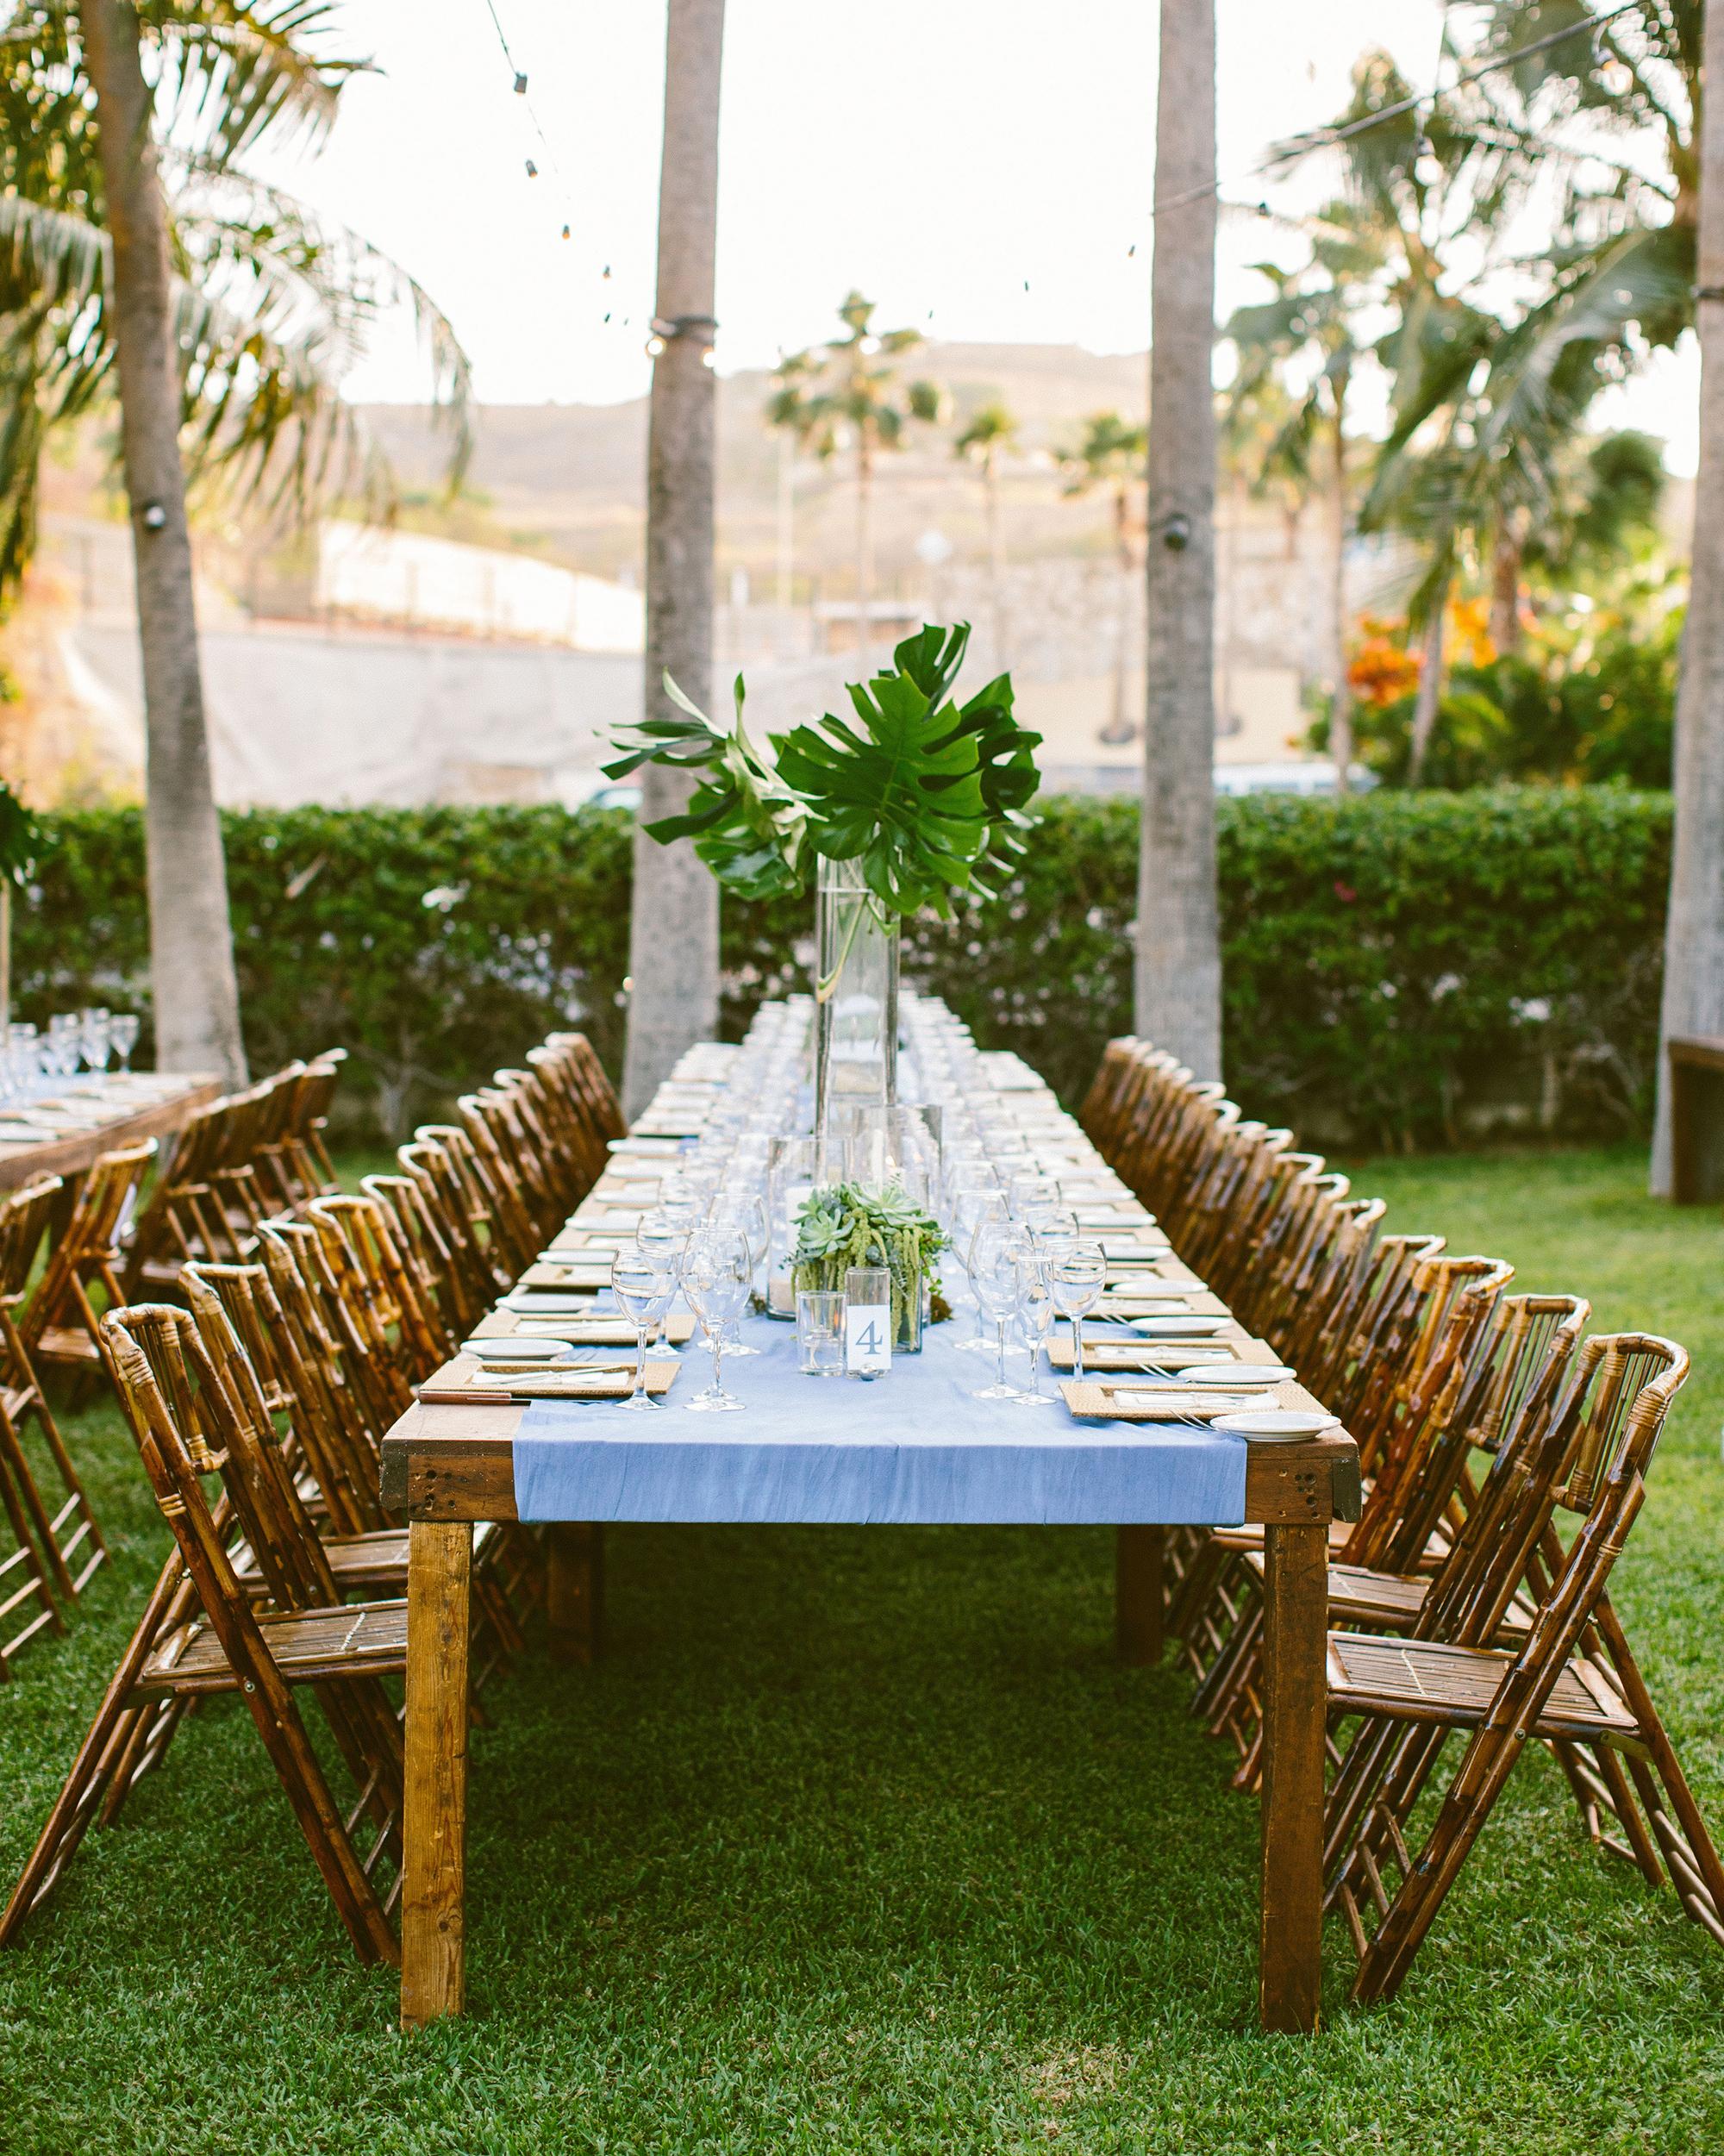 ali-jess-wedding-reception-065-002-s111717-1214.jpg